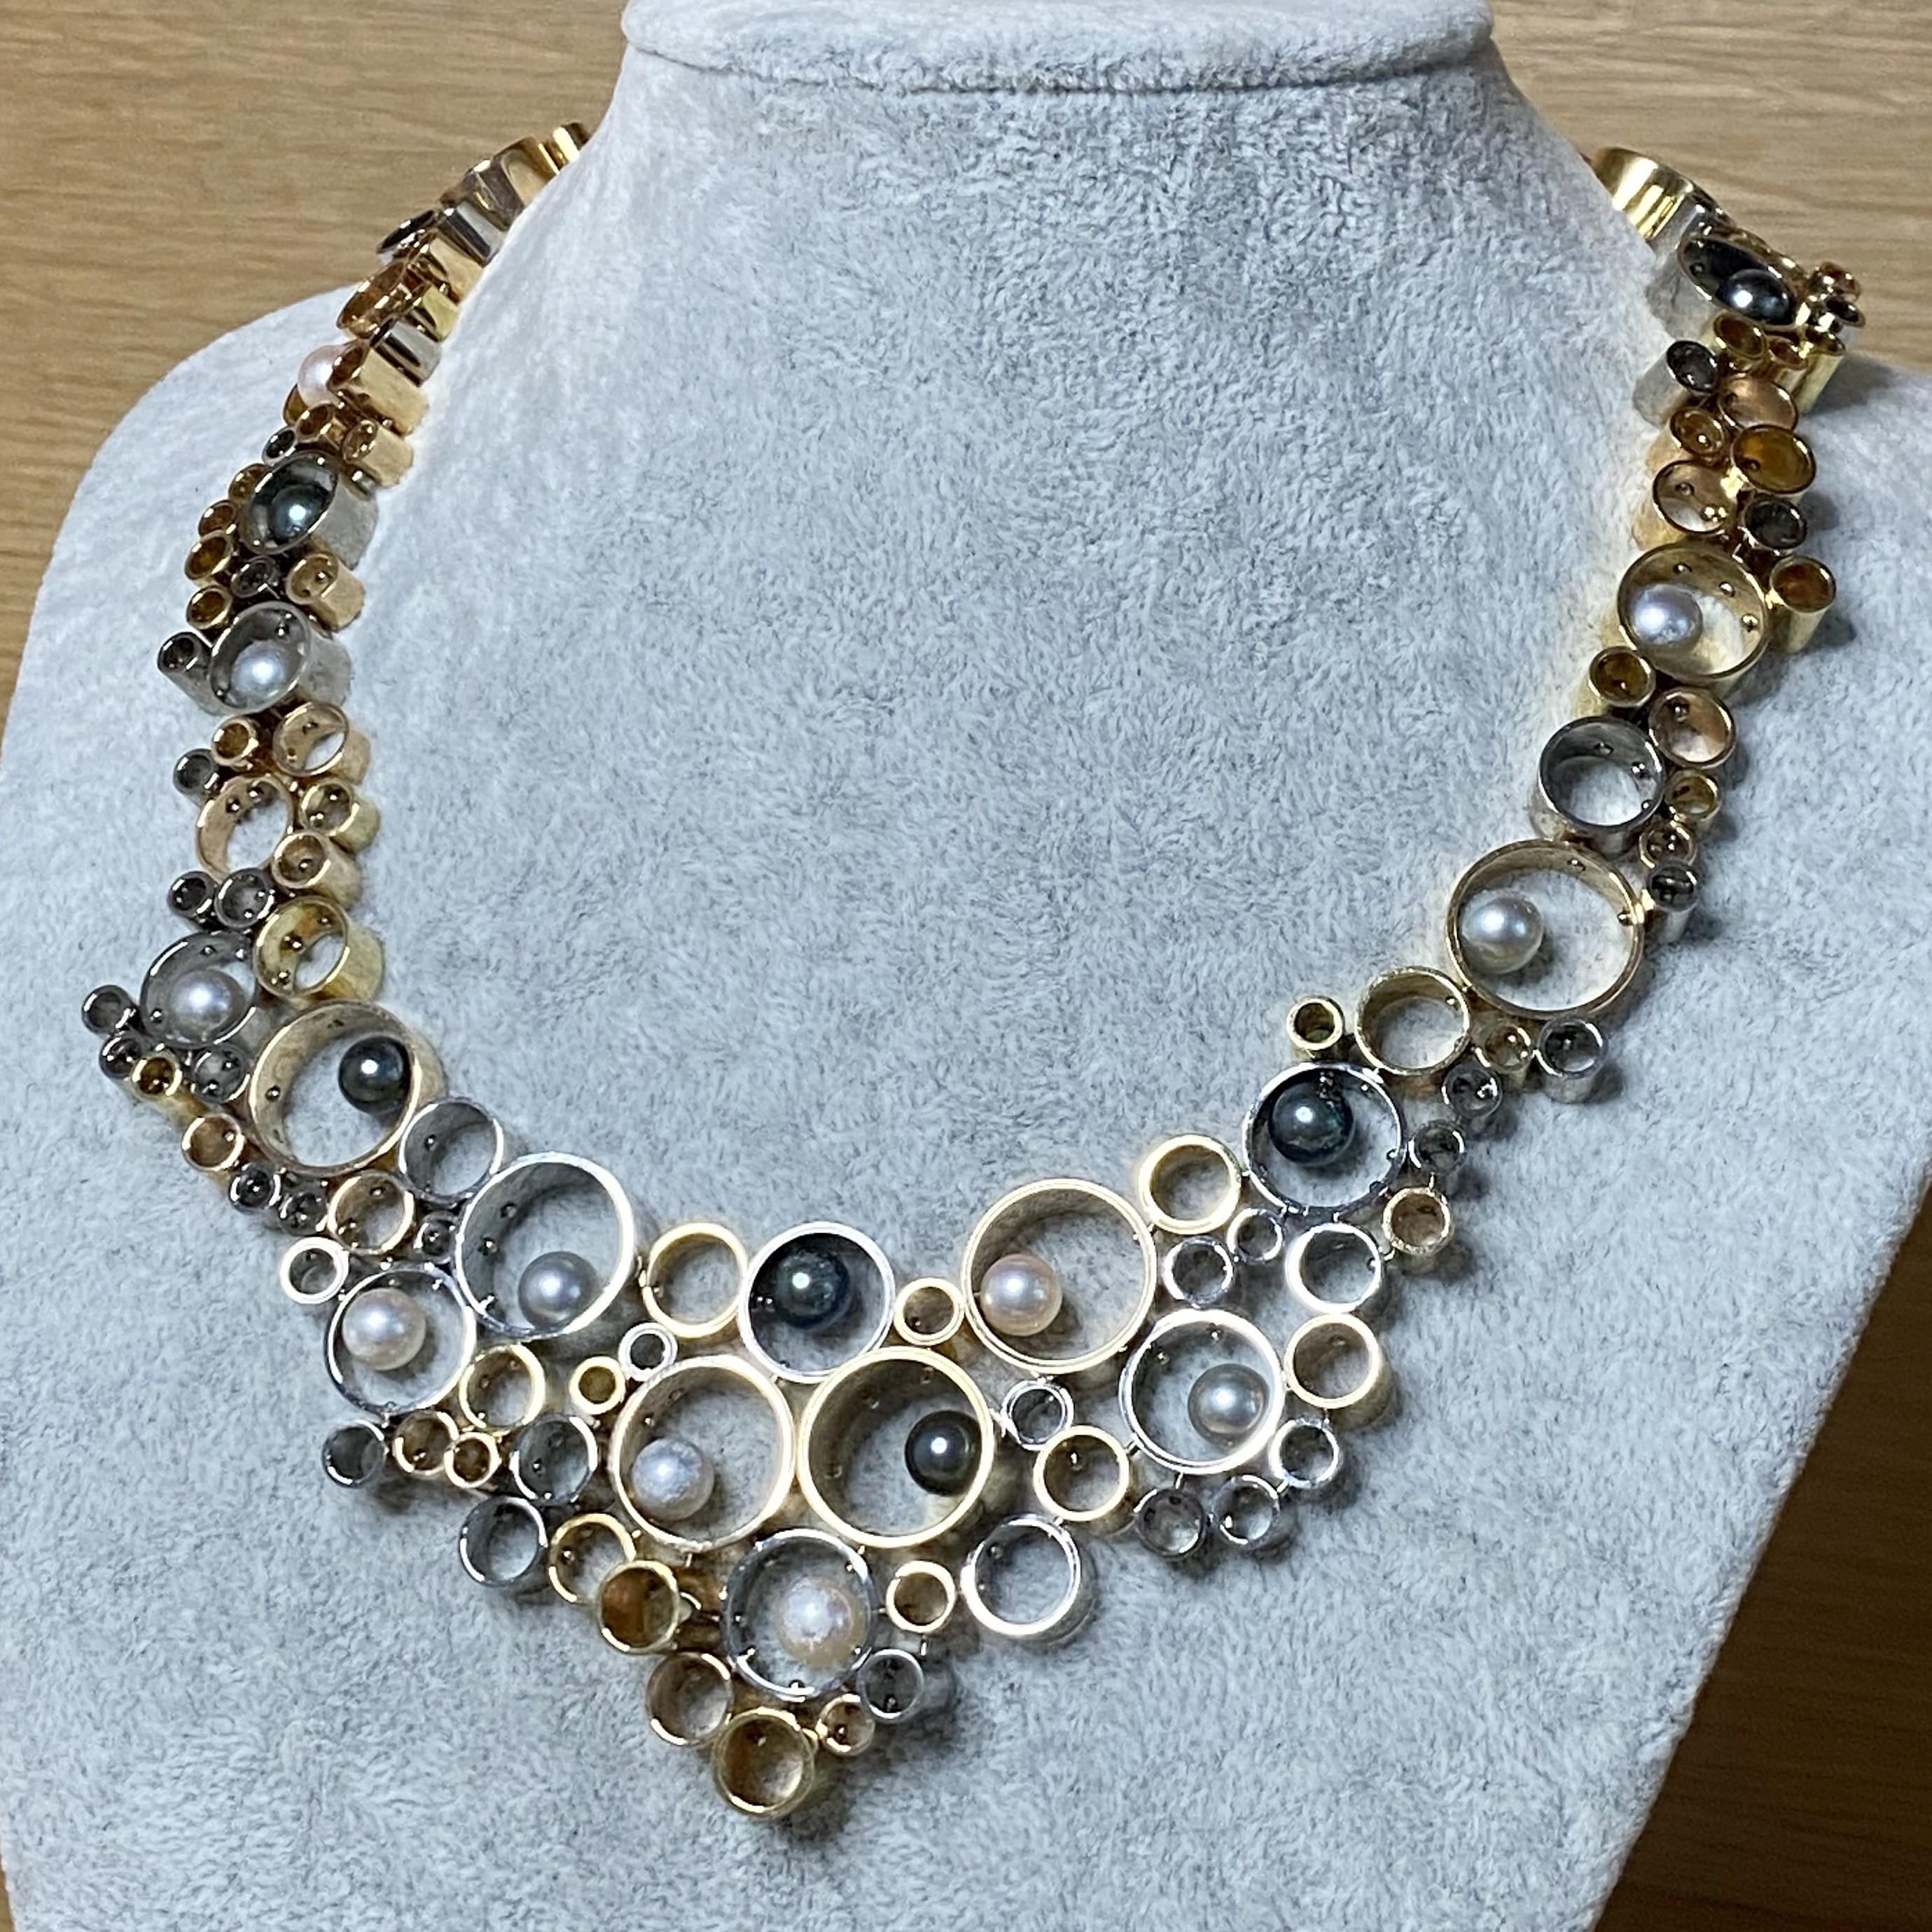 Jewellery - Image 5 of 5